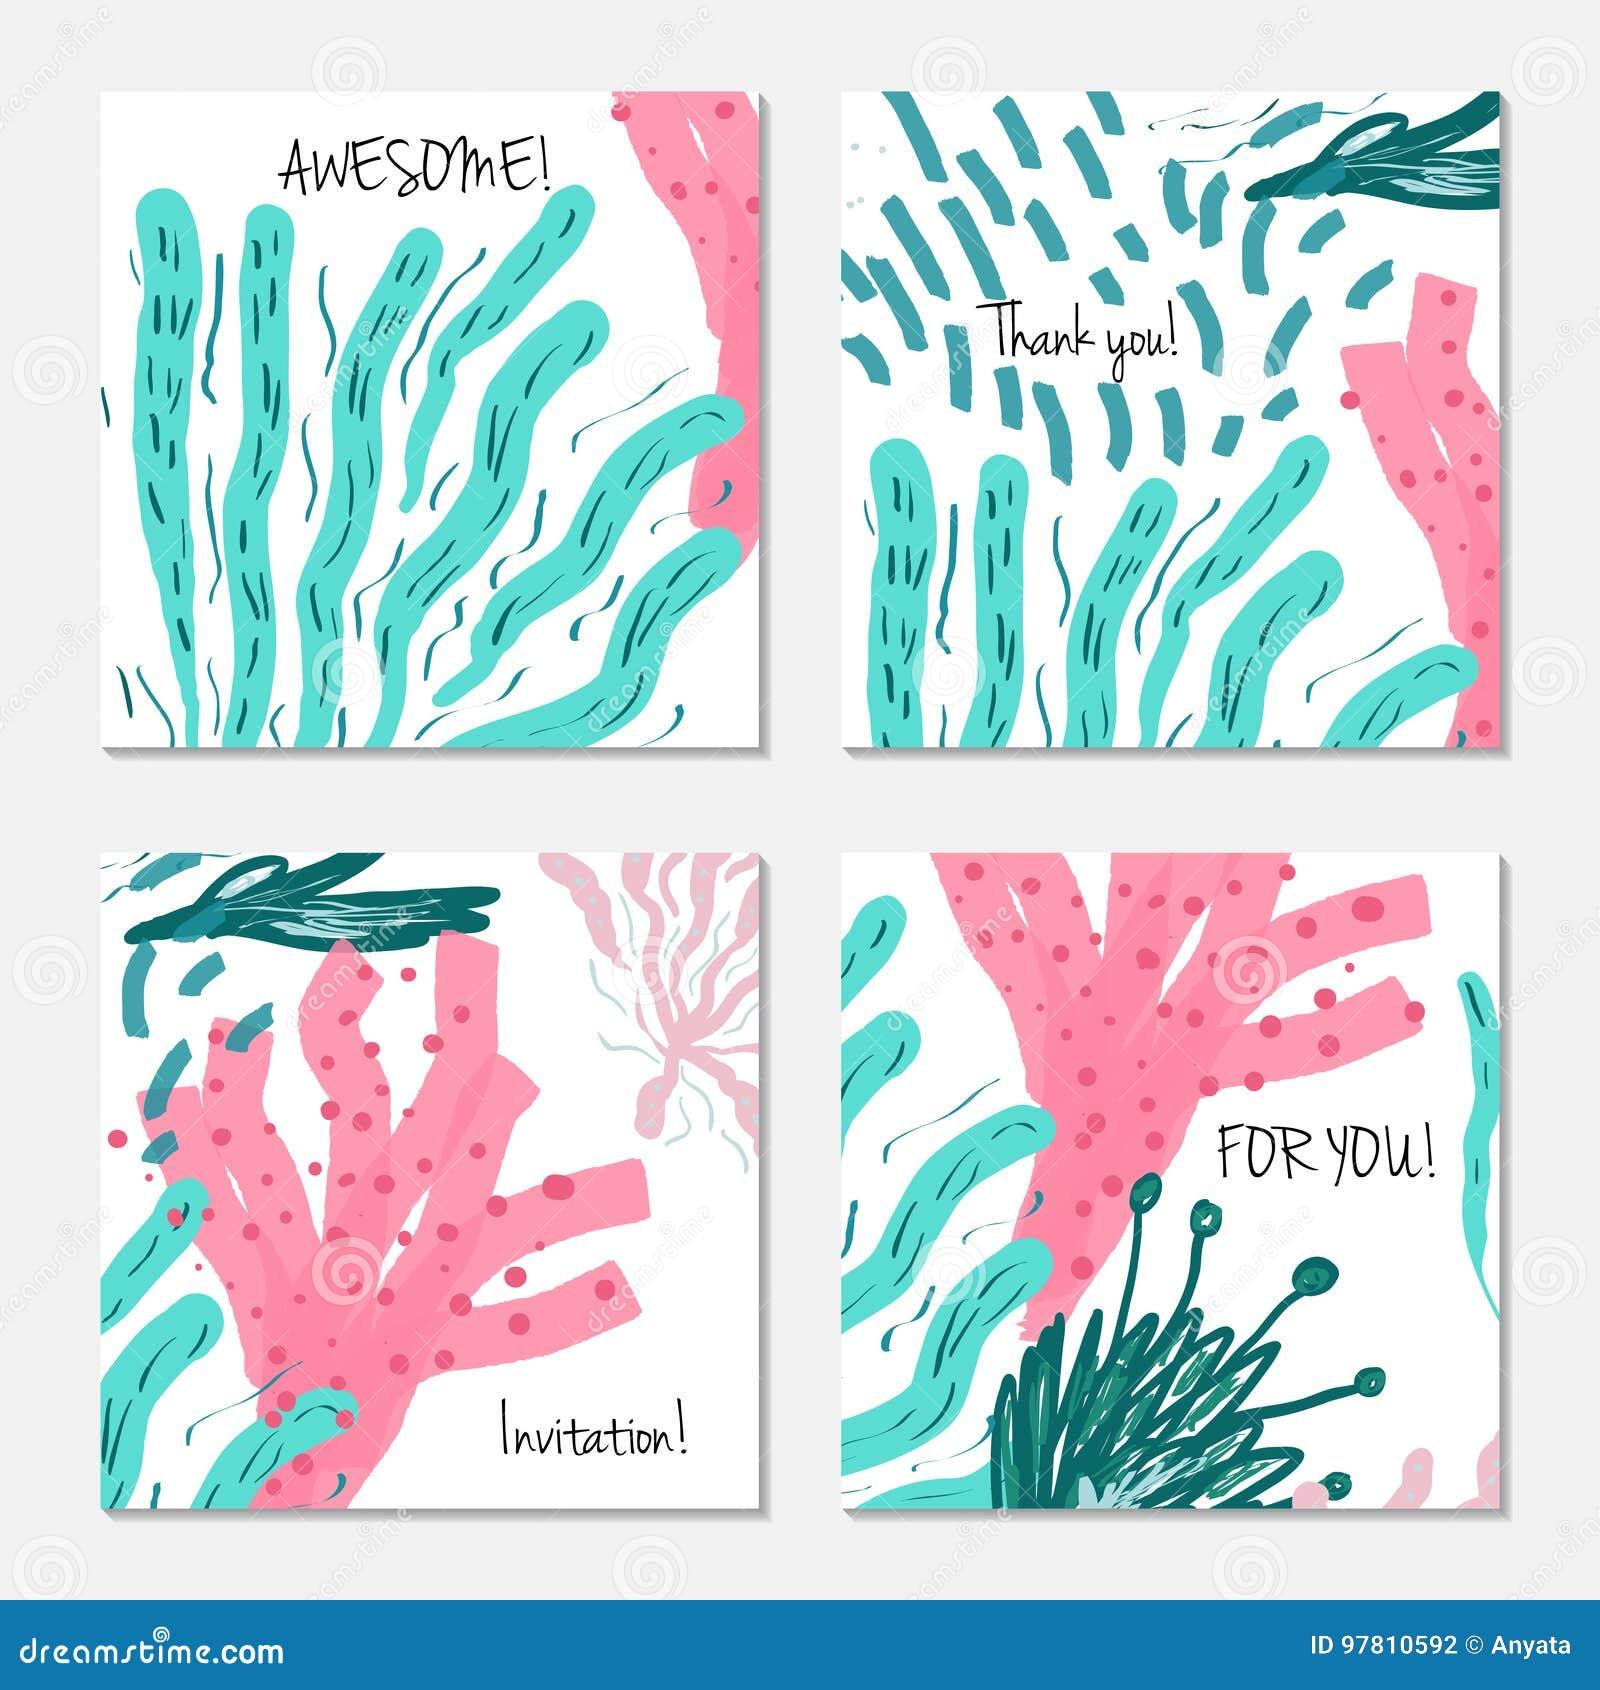 Hand drawn creative invitation greeting cards stock vector download hand drawn creative invitation greeting cards stock vector illustration of drawing creative m4hsunfo